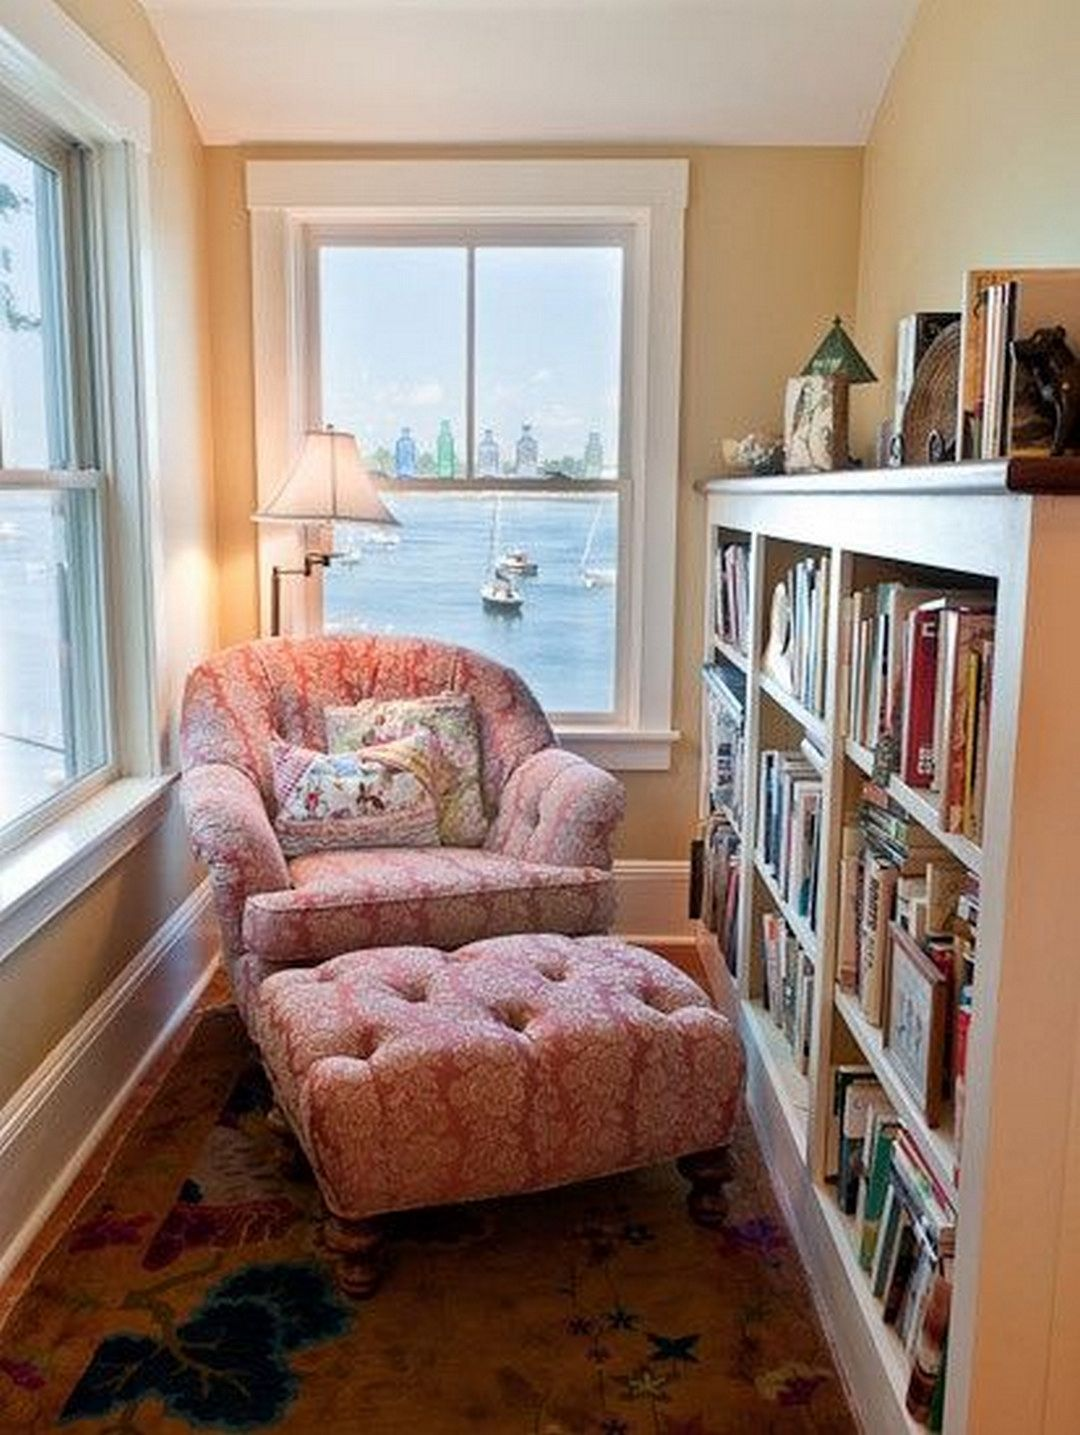 114 cozy reading room interior ideas https www futuristarchitecture com